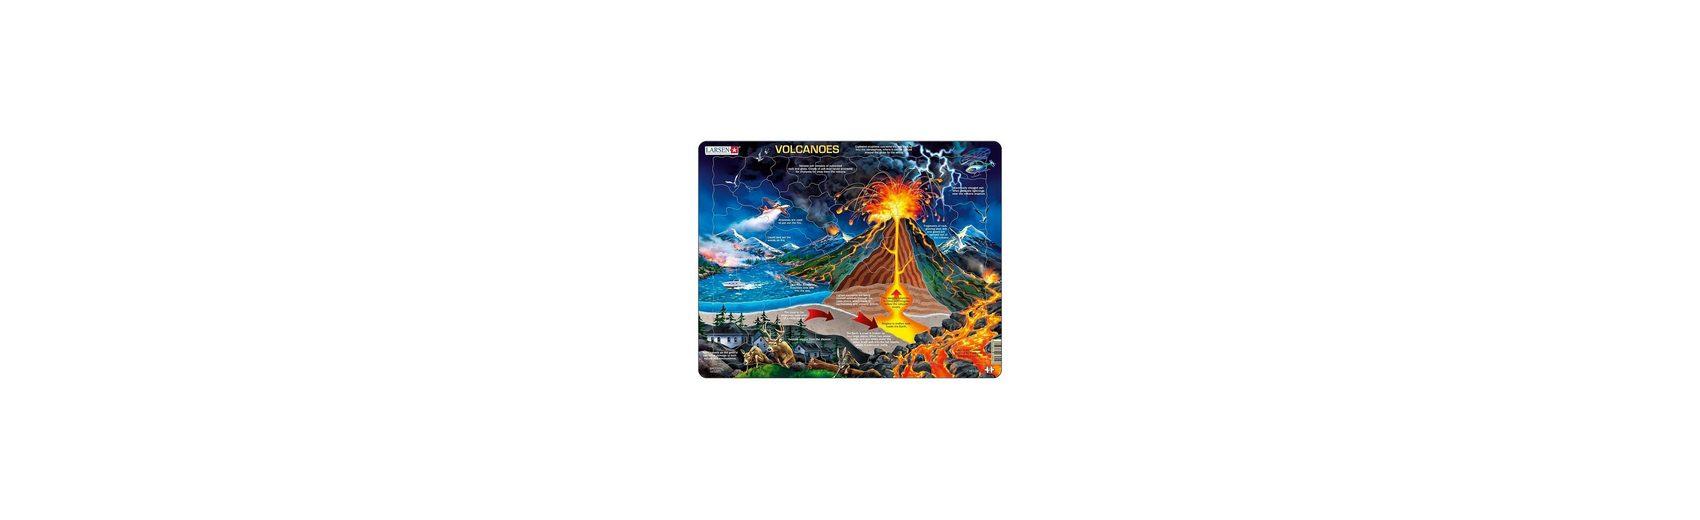 Larsen Rahmenpuzzle: Vulkane - 70 Teile